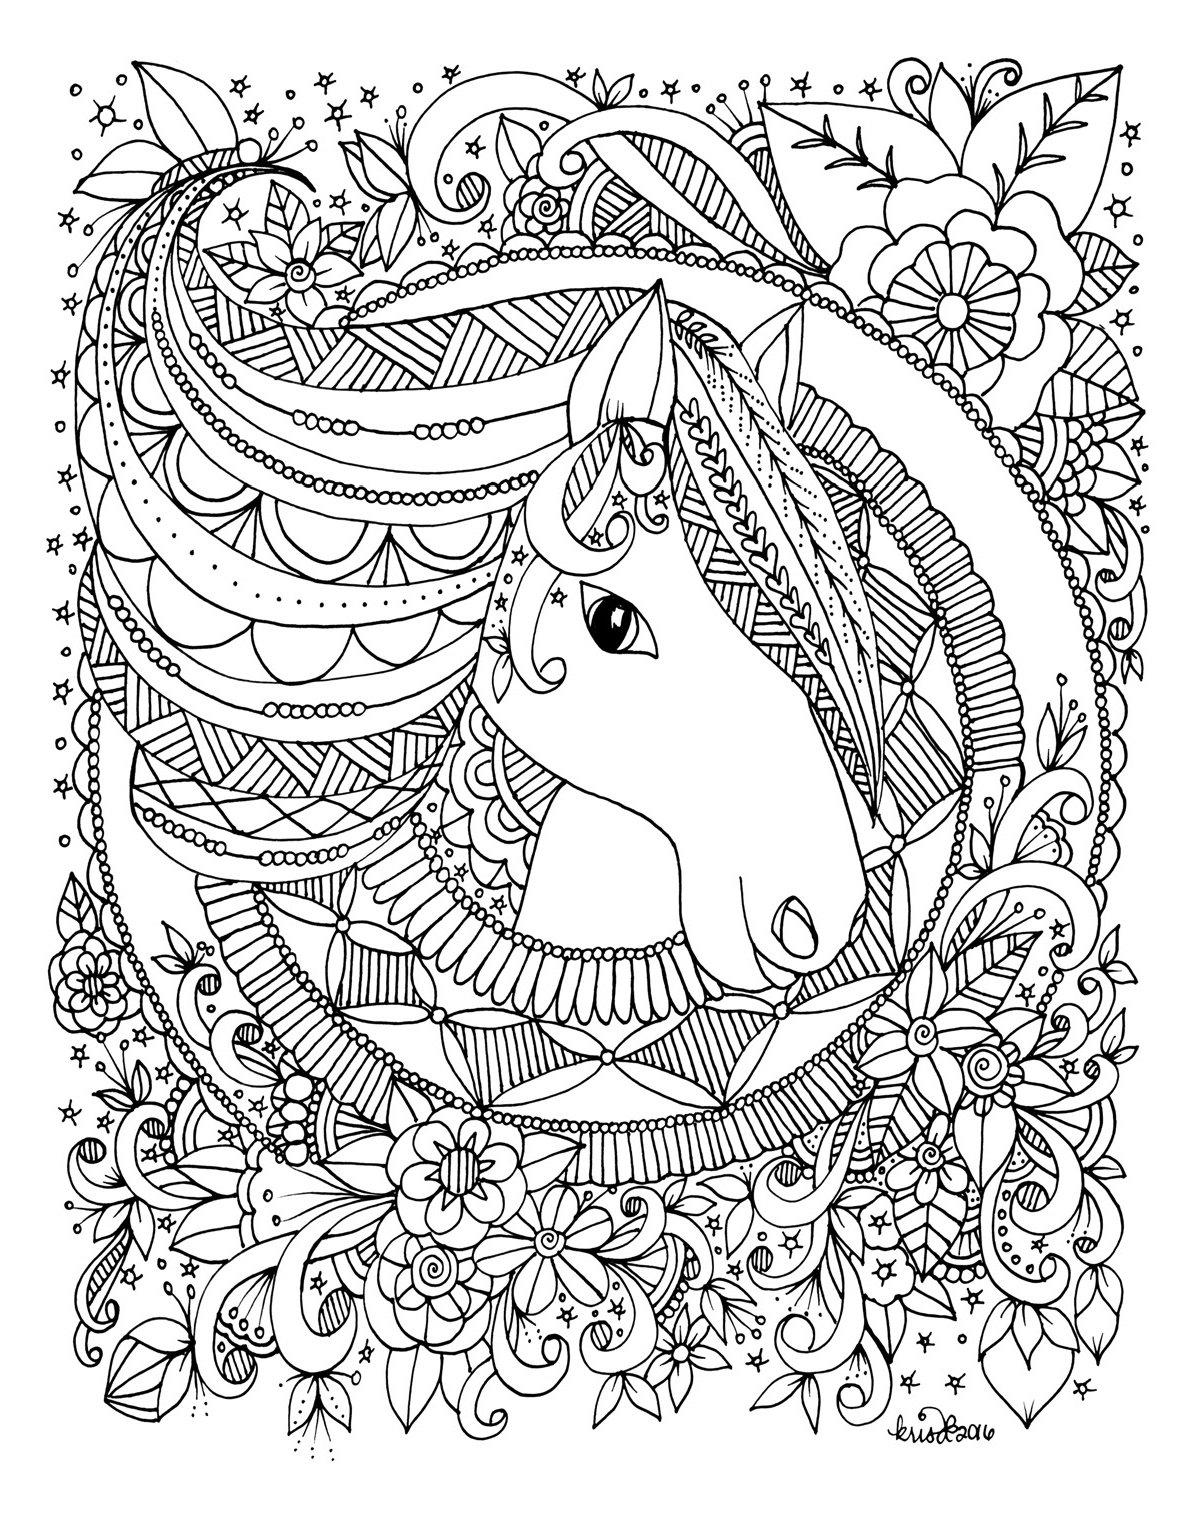 KC Doodle Art Whimsical Animals Coloring Book: Amazon.de: Krisa ...